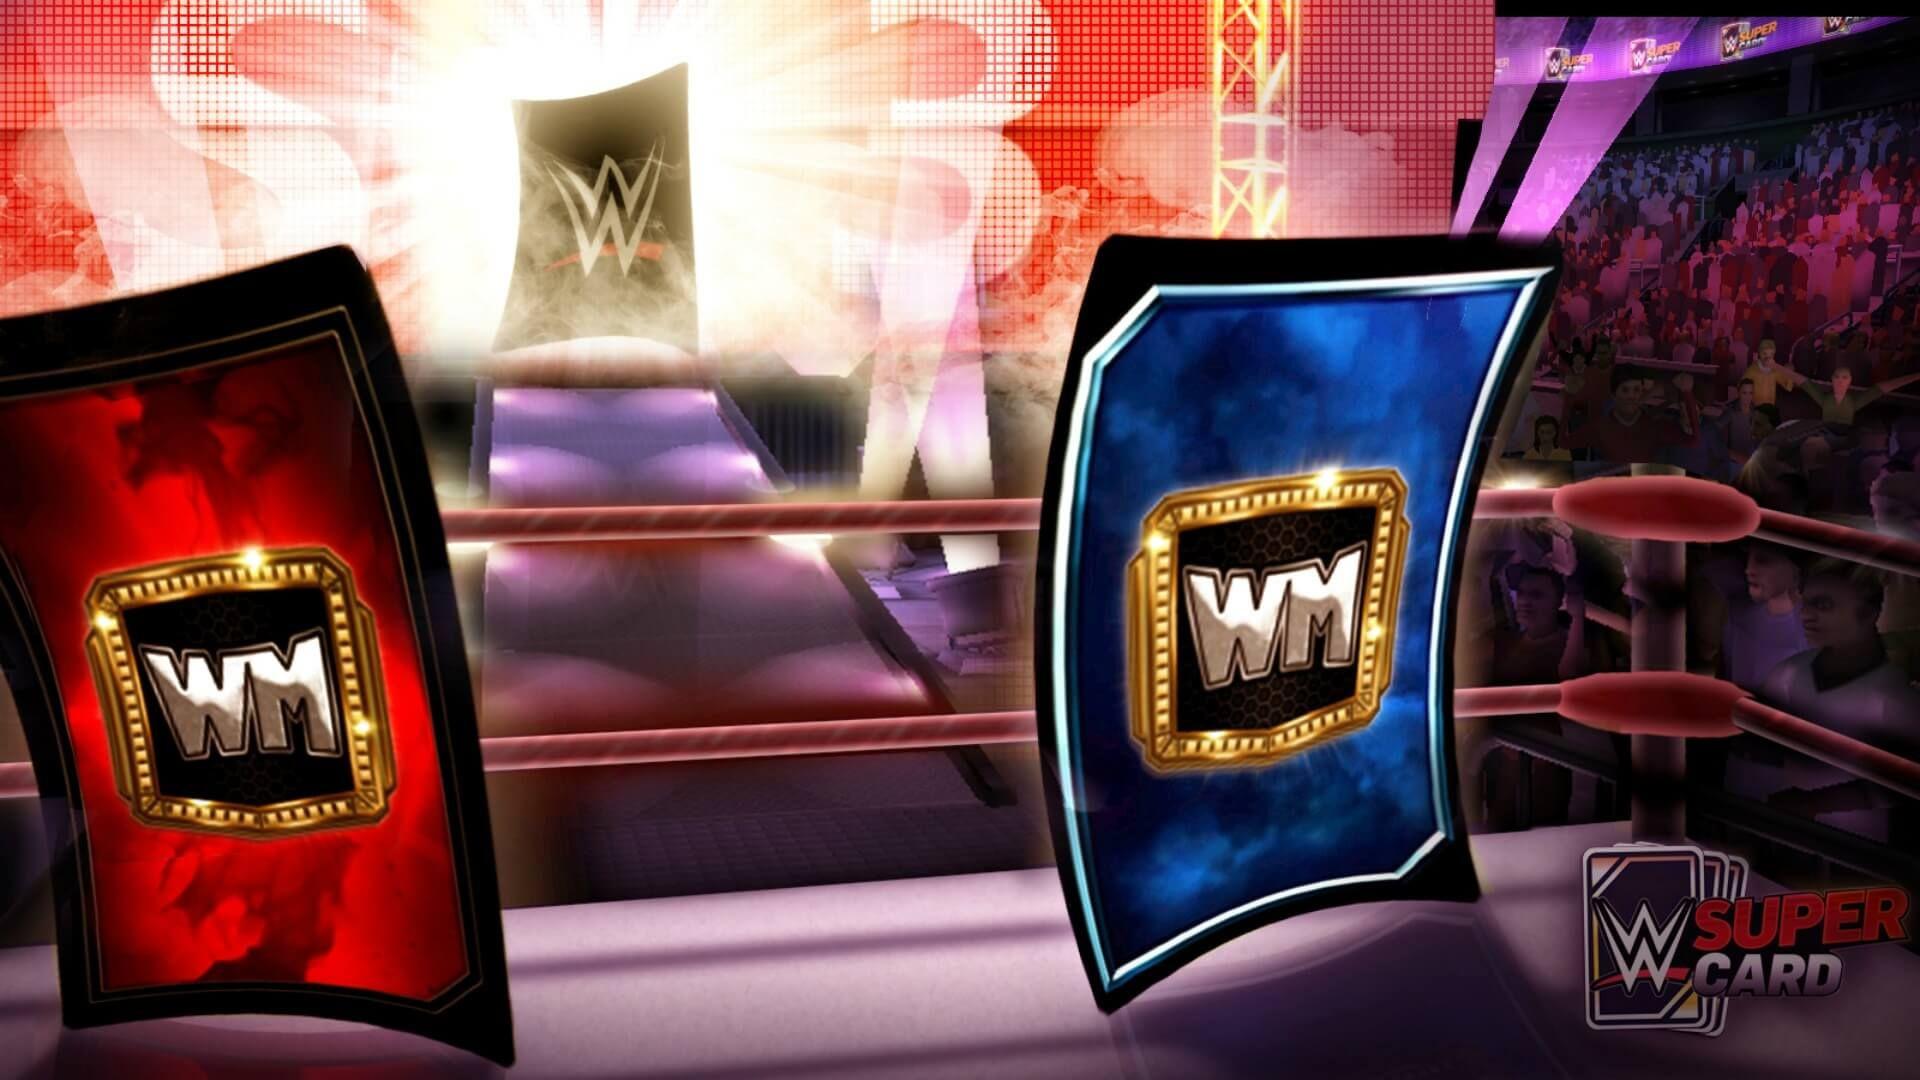 Wwe 2k News Wwe Supercard Season 2 Continuing Through Fall